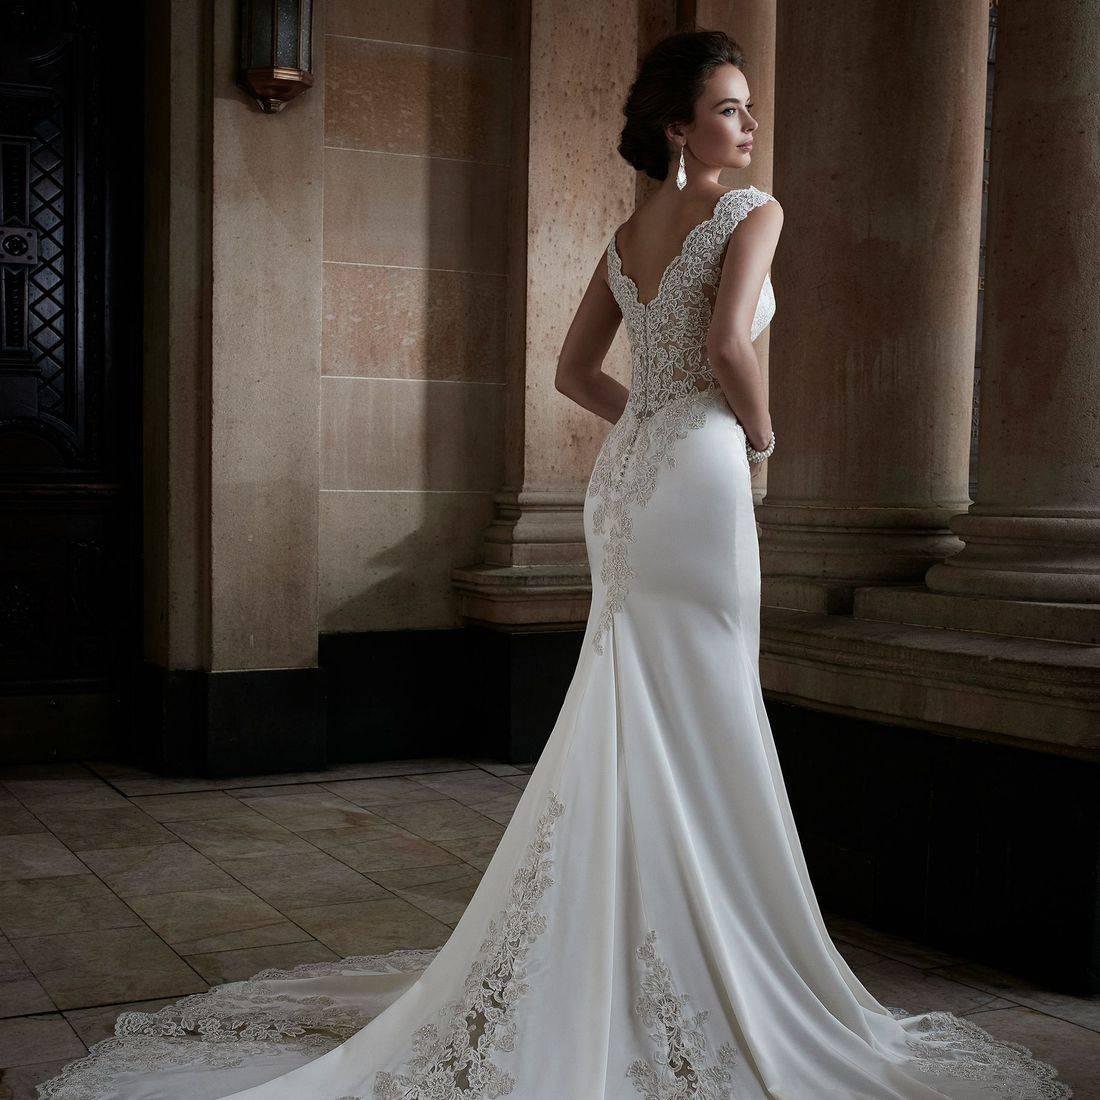 sleeveless wedding dress, sophia tolli, sophia tolli wedding dress, satin wedding dress, fit and flare wedding dress,  v neck wedding dress, plunging neckline wedding dress,